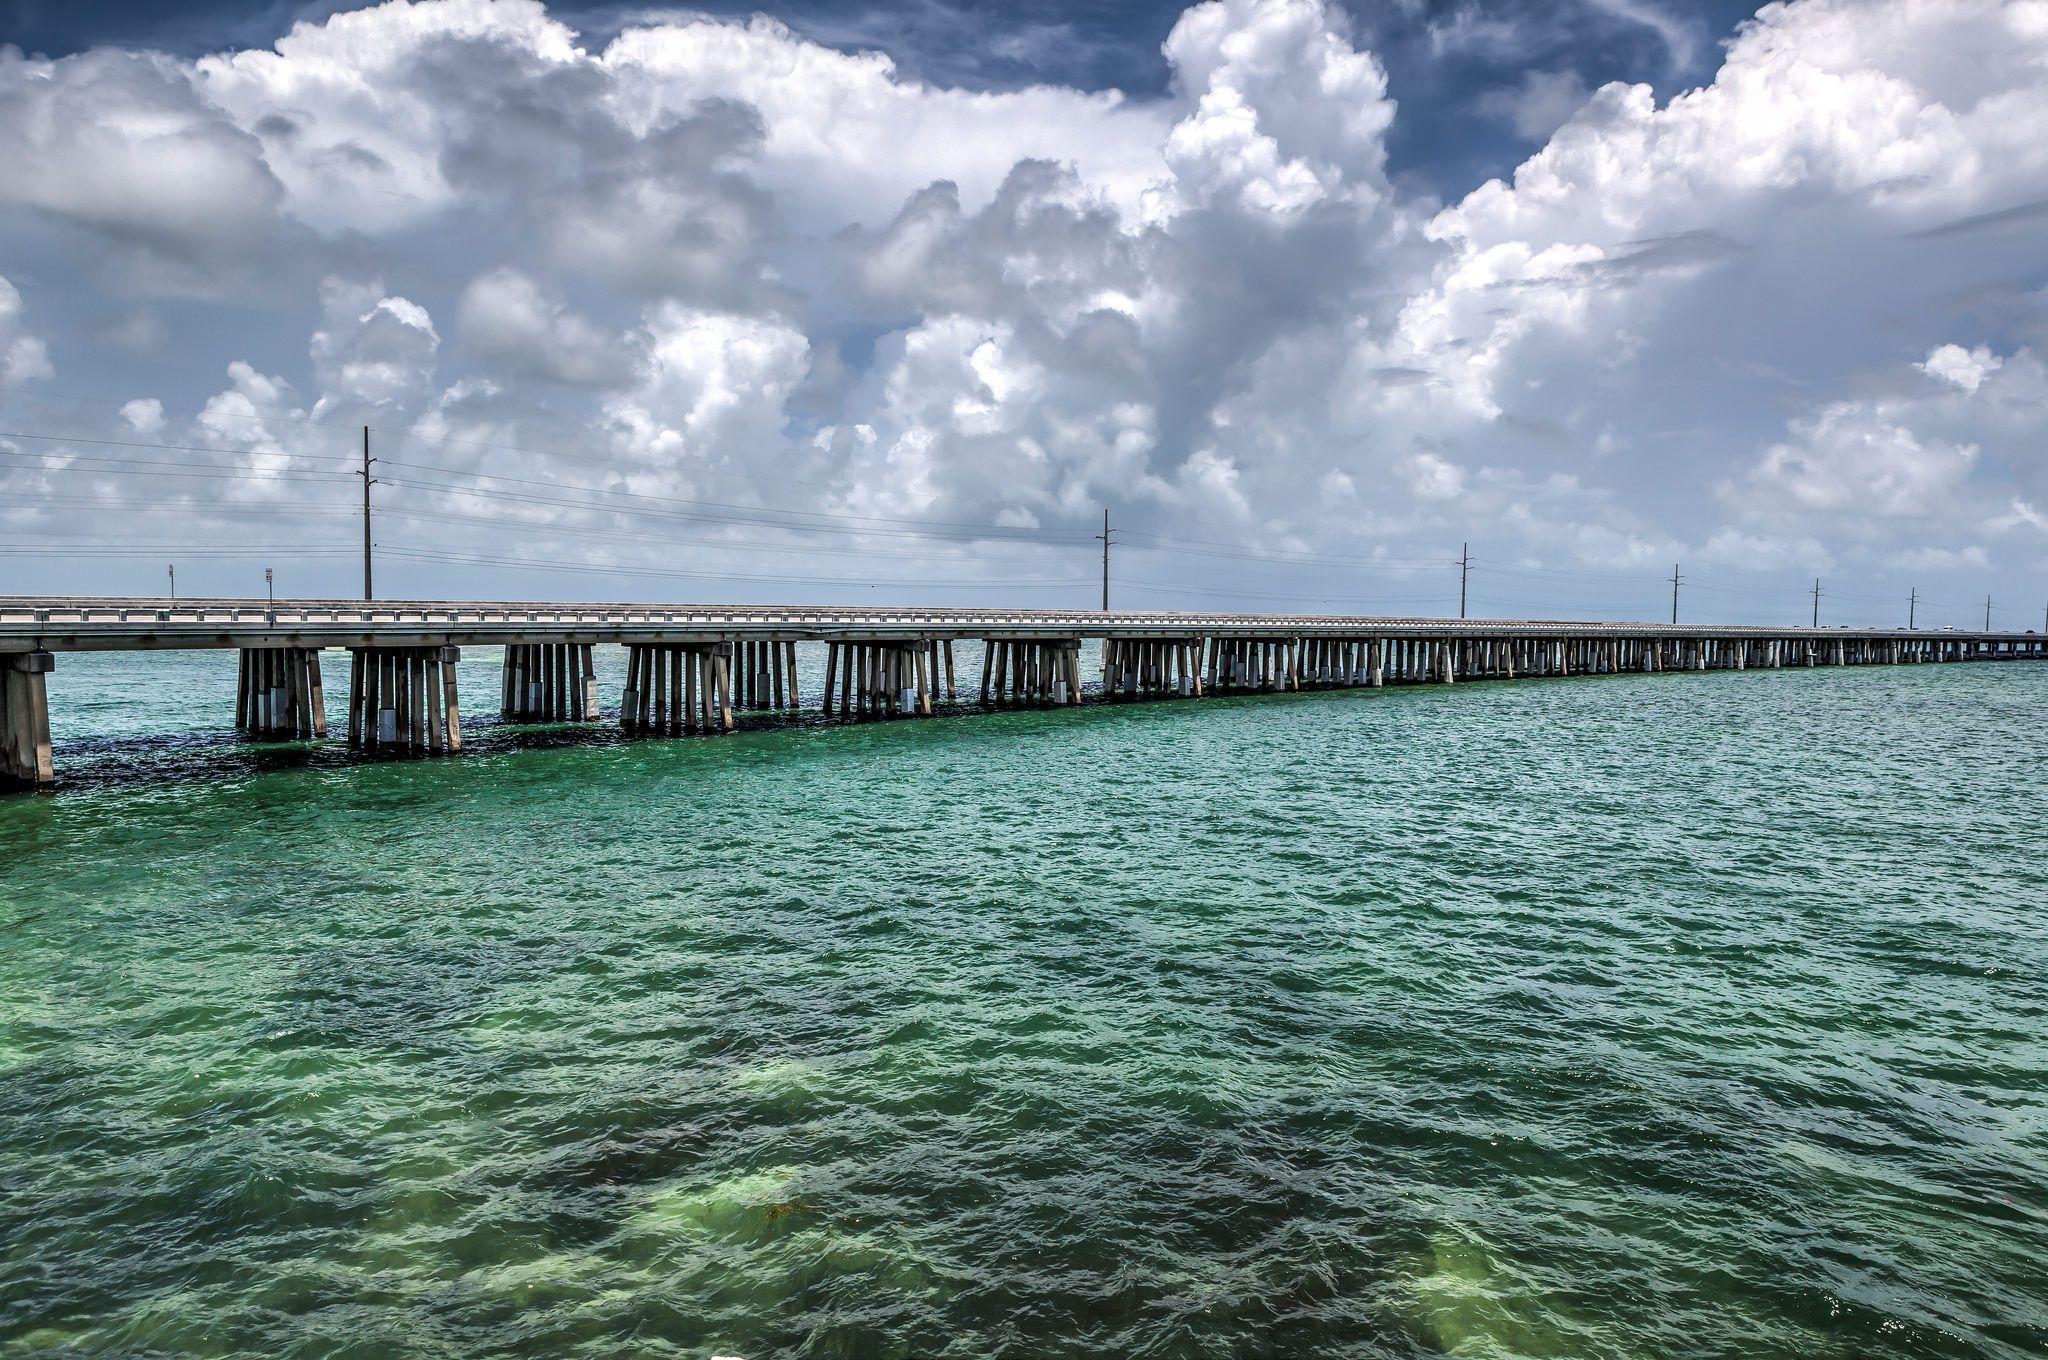 A Roadtrip to the Florida Keys and Key West